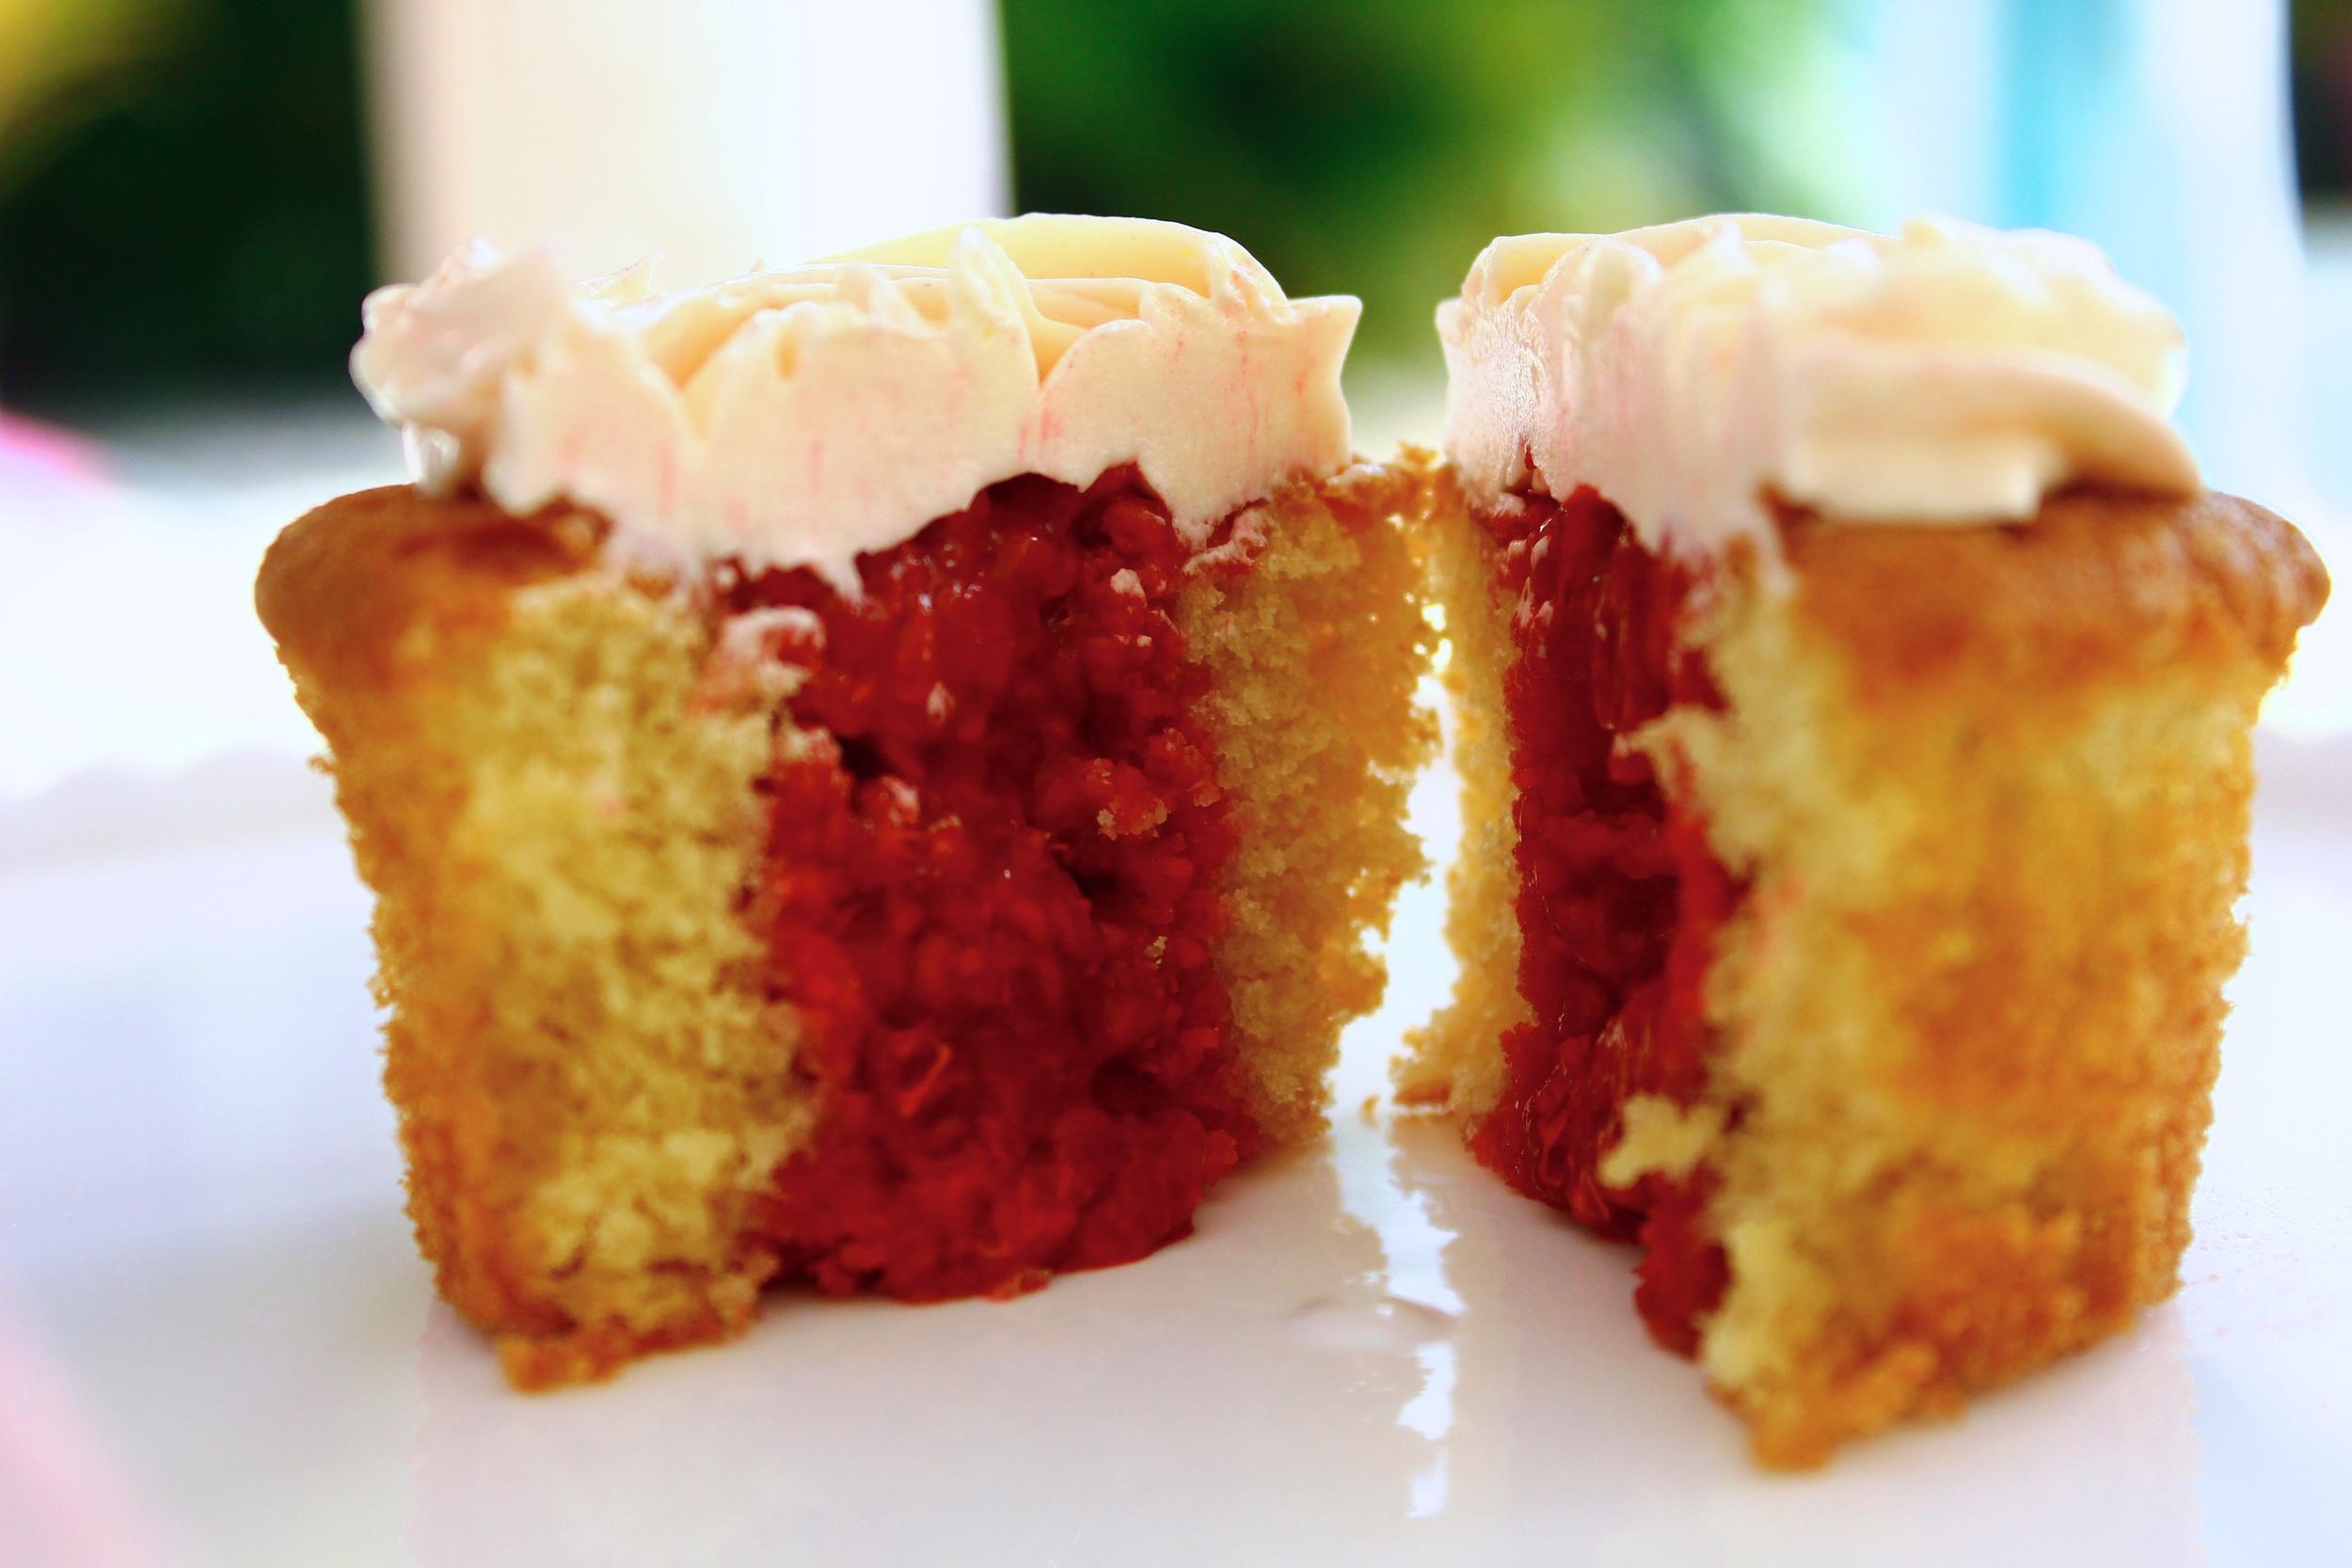 Cupcake fourrée